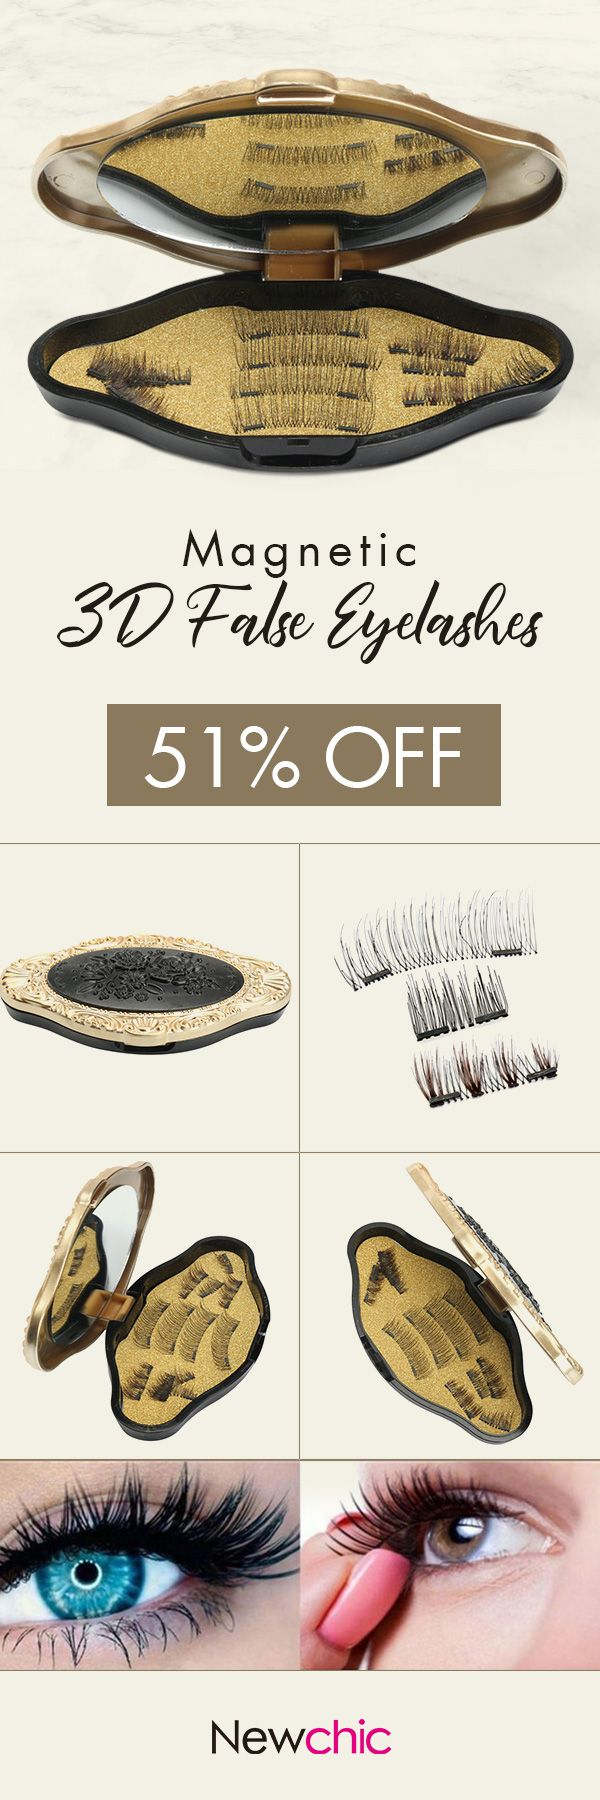 [Newchic Online Shopping] 51%OFF Magnetic 3D False Eyelashes